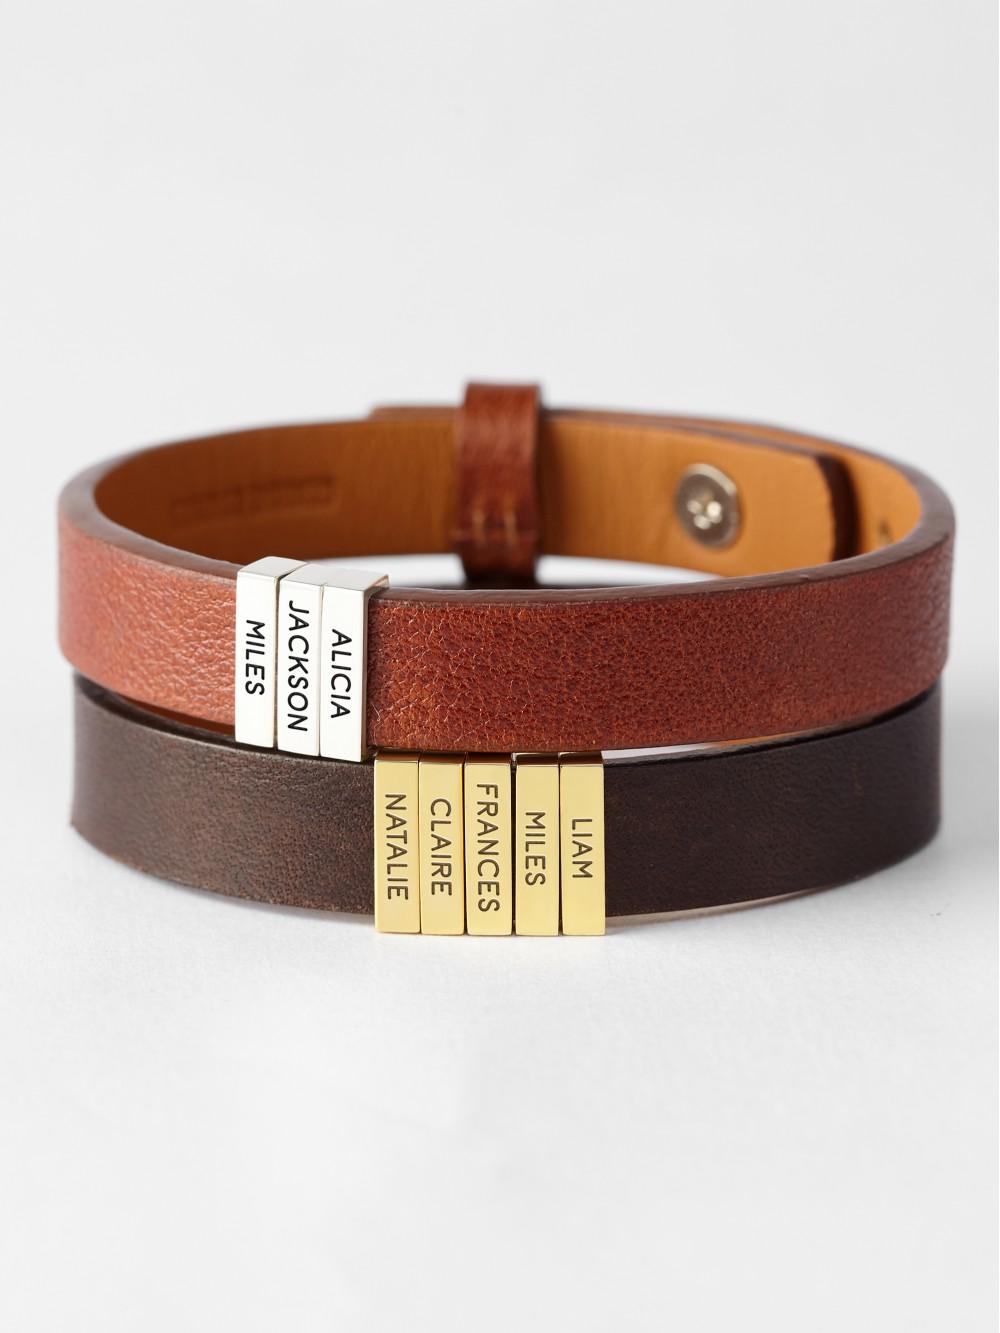 Children's Name Bracelet For Dad